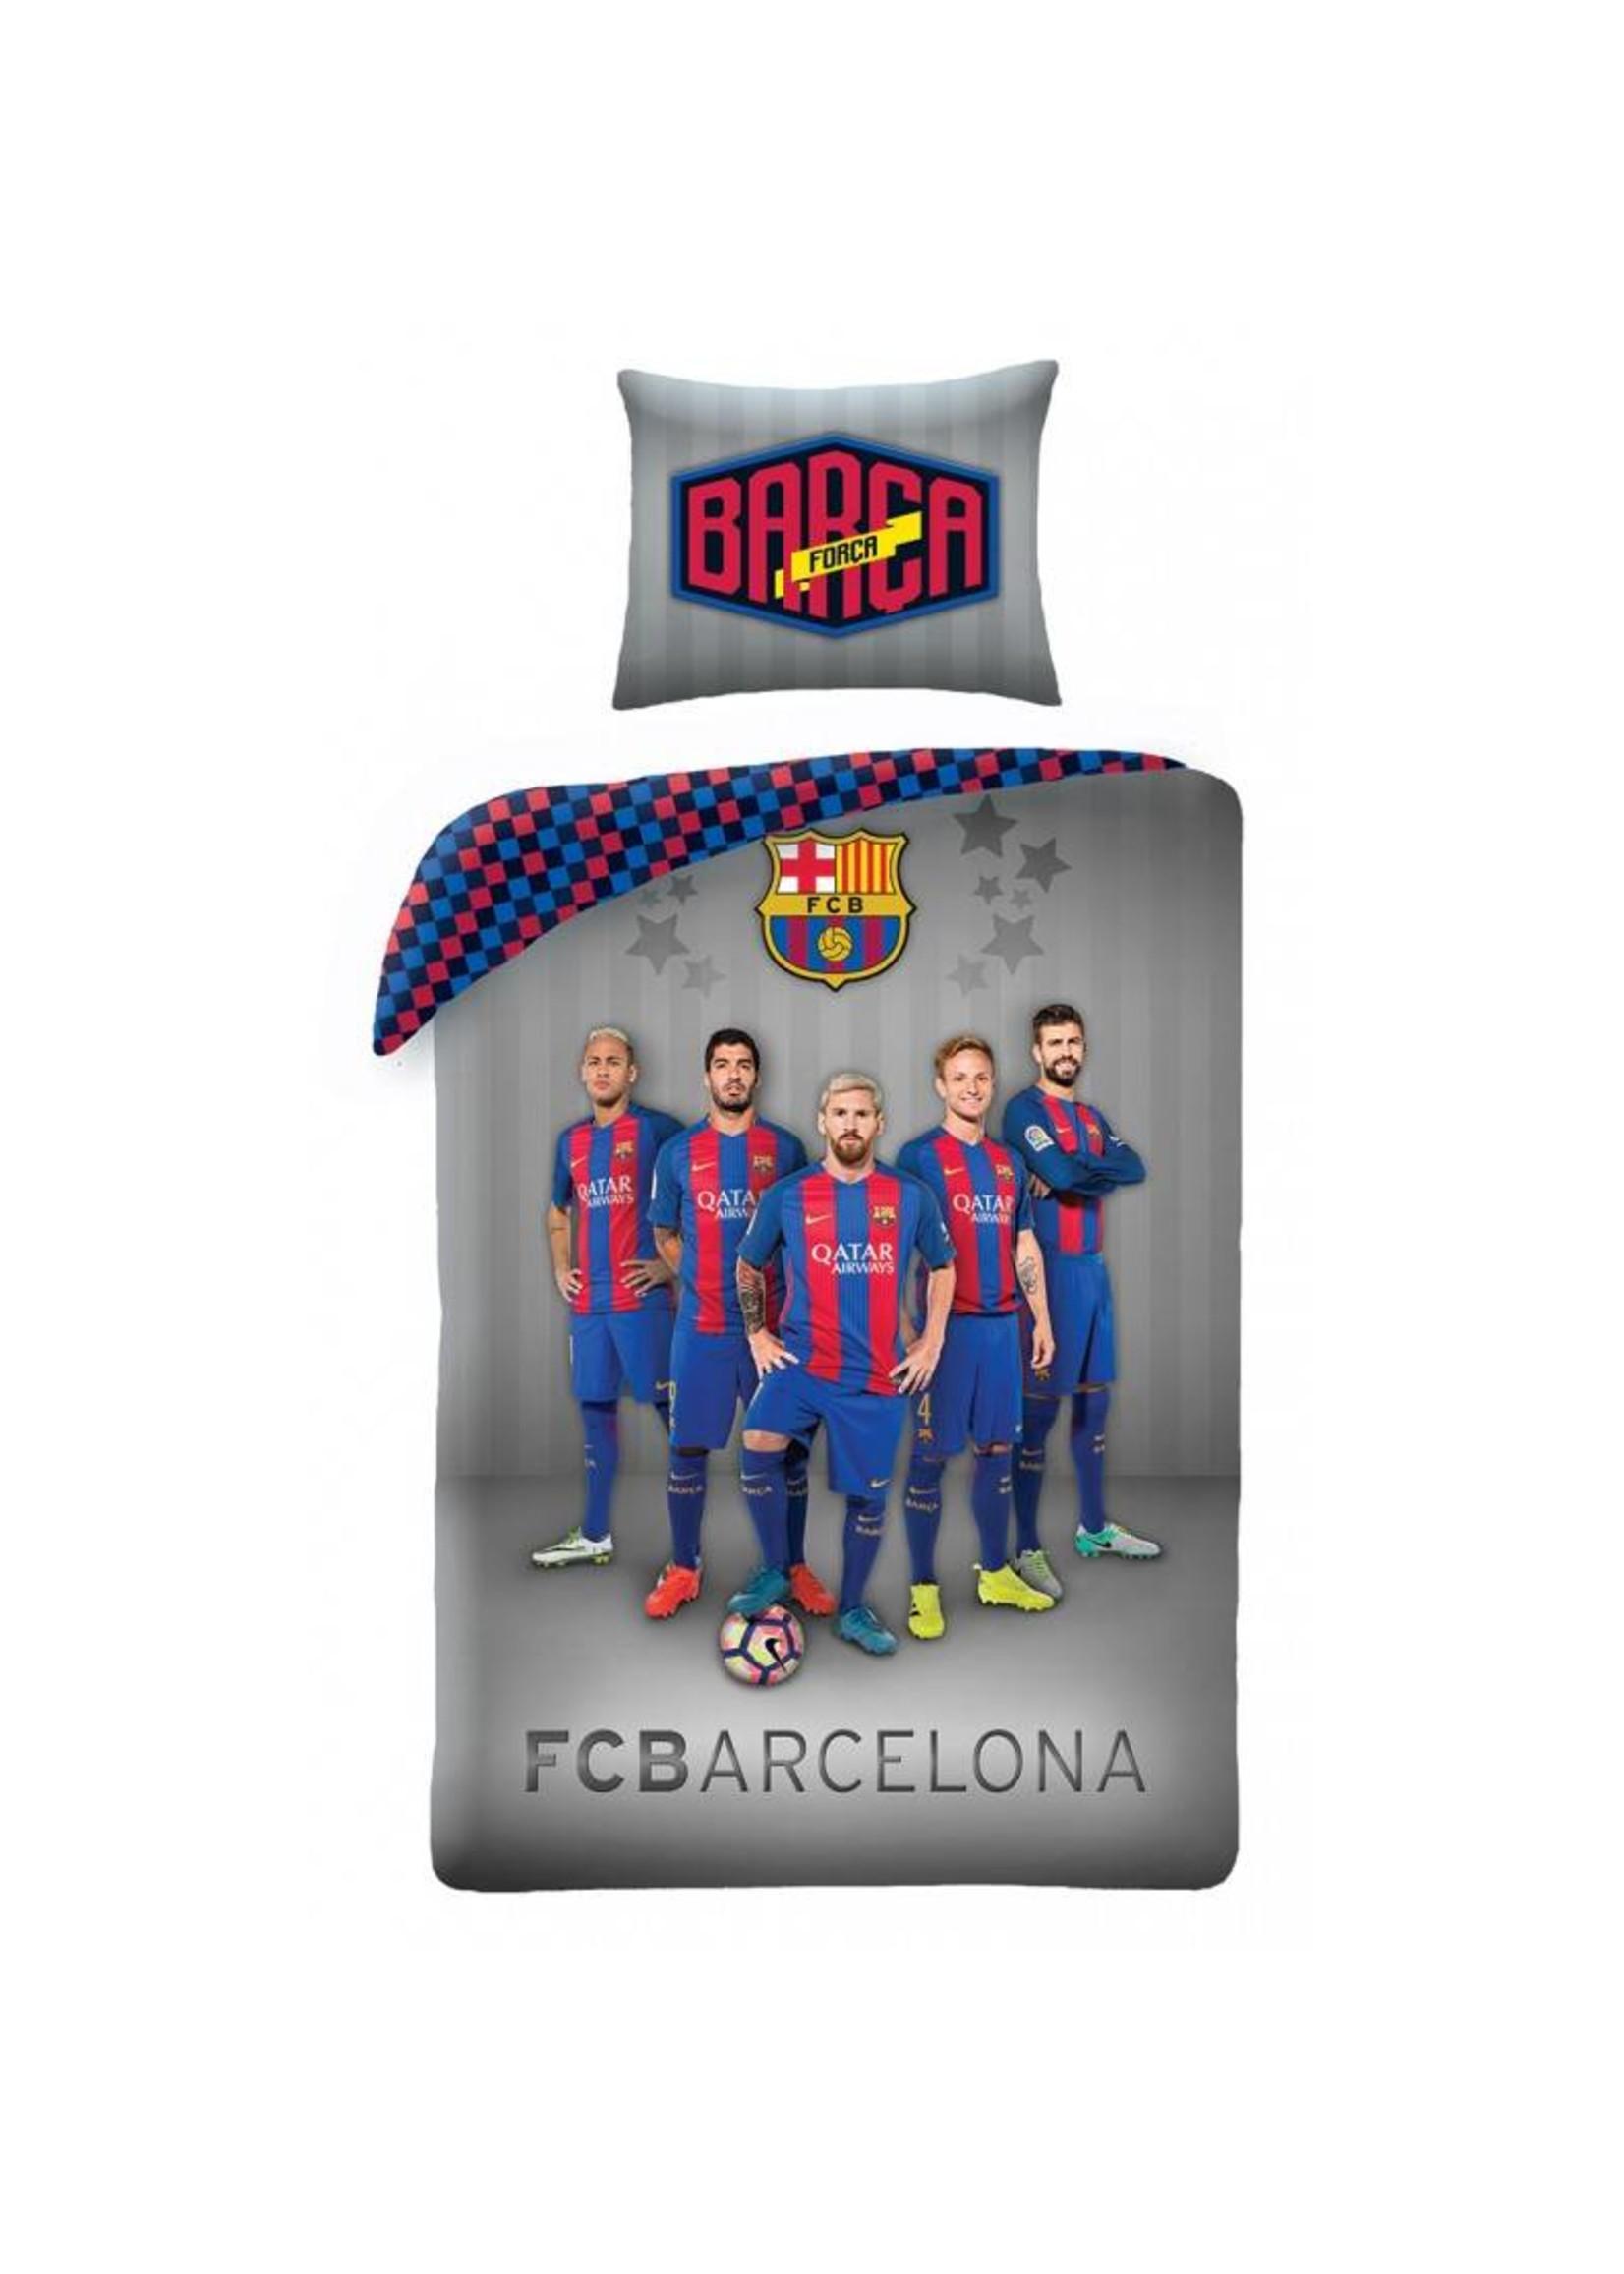 Barcelona Dekbedovertrek Barca Forca